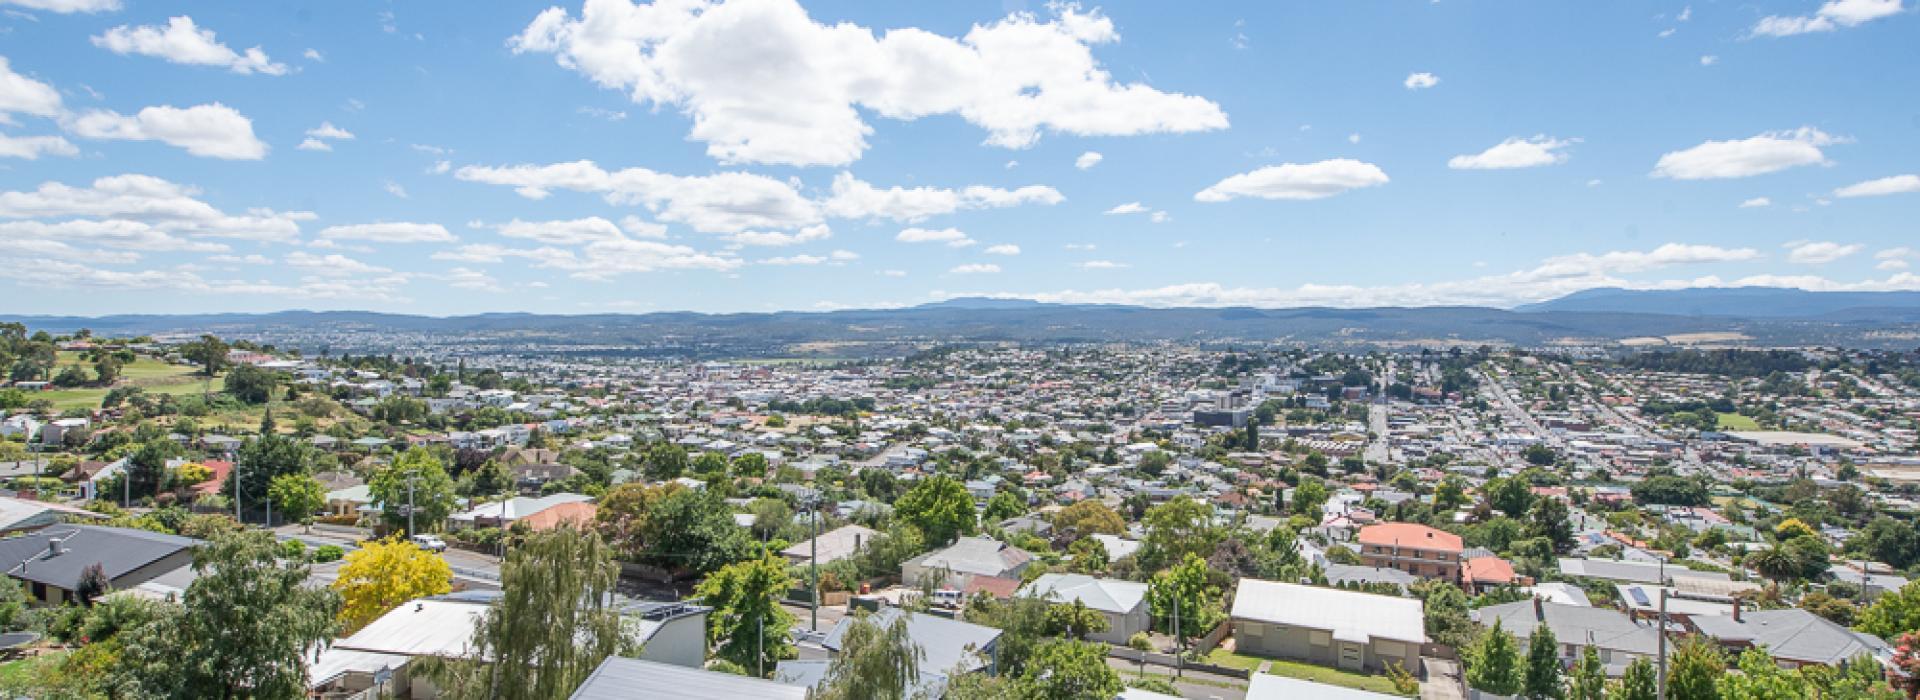 Flanagan Residential | Rae Smith | Paul Flanagan | Property Sales | West Launceston